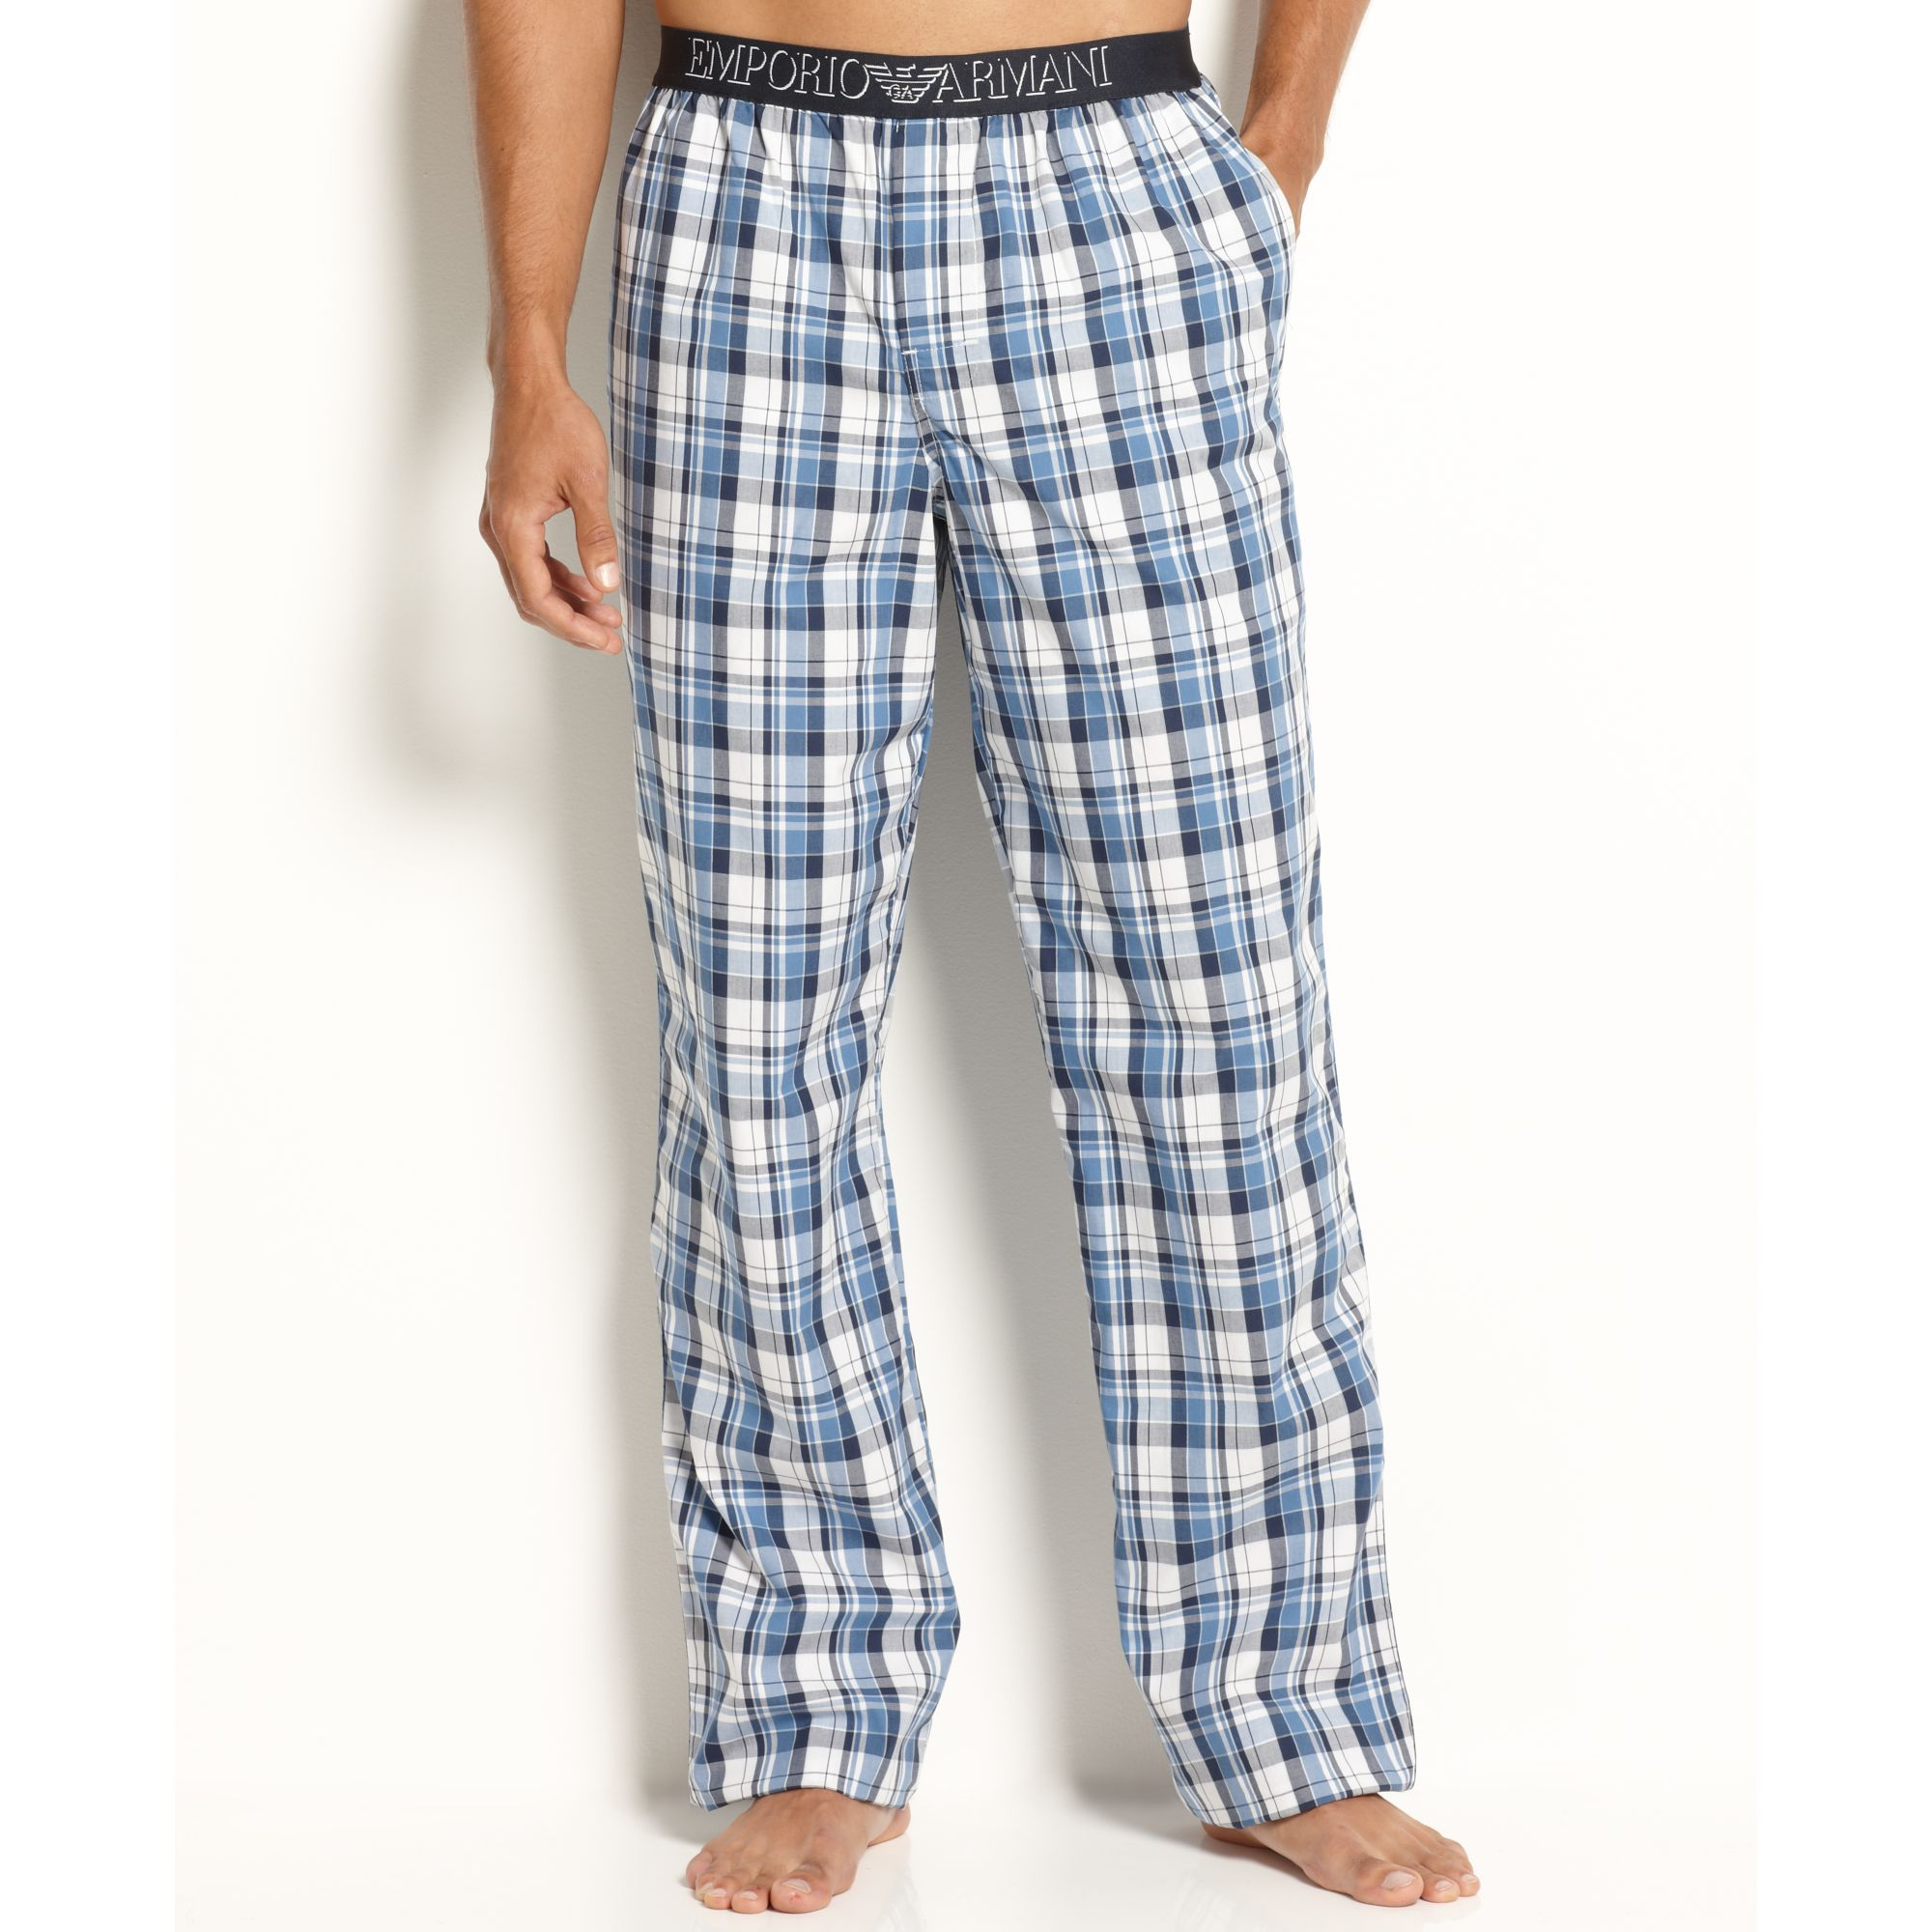 b17534ce70 Lyst - Emporio Armani Woven Pajama Pants in White for Men